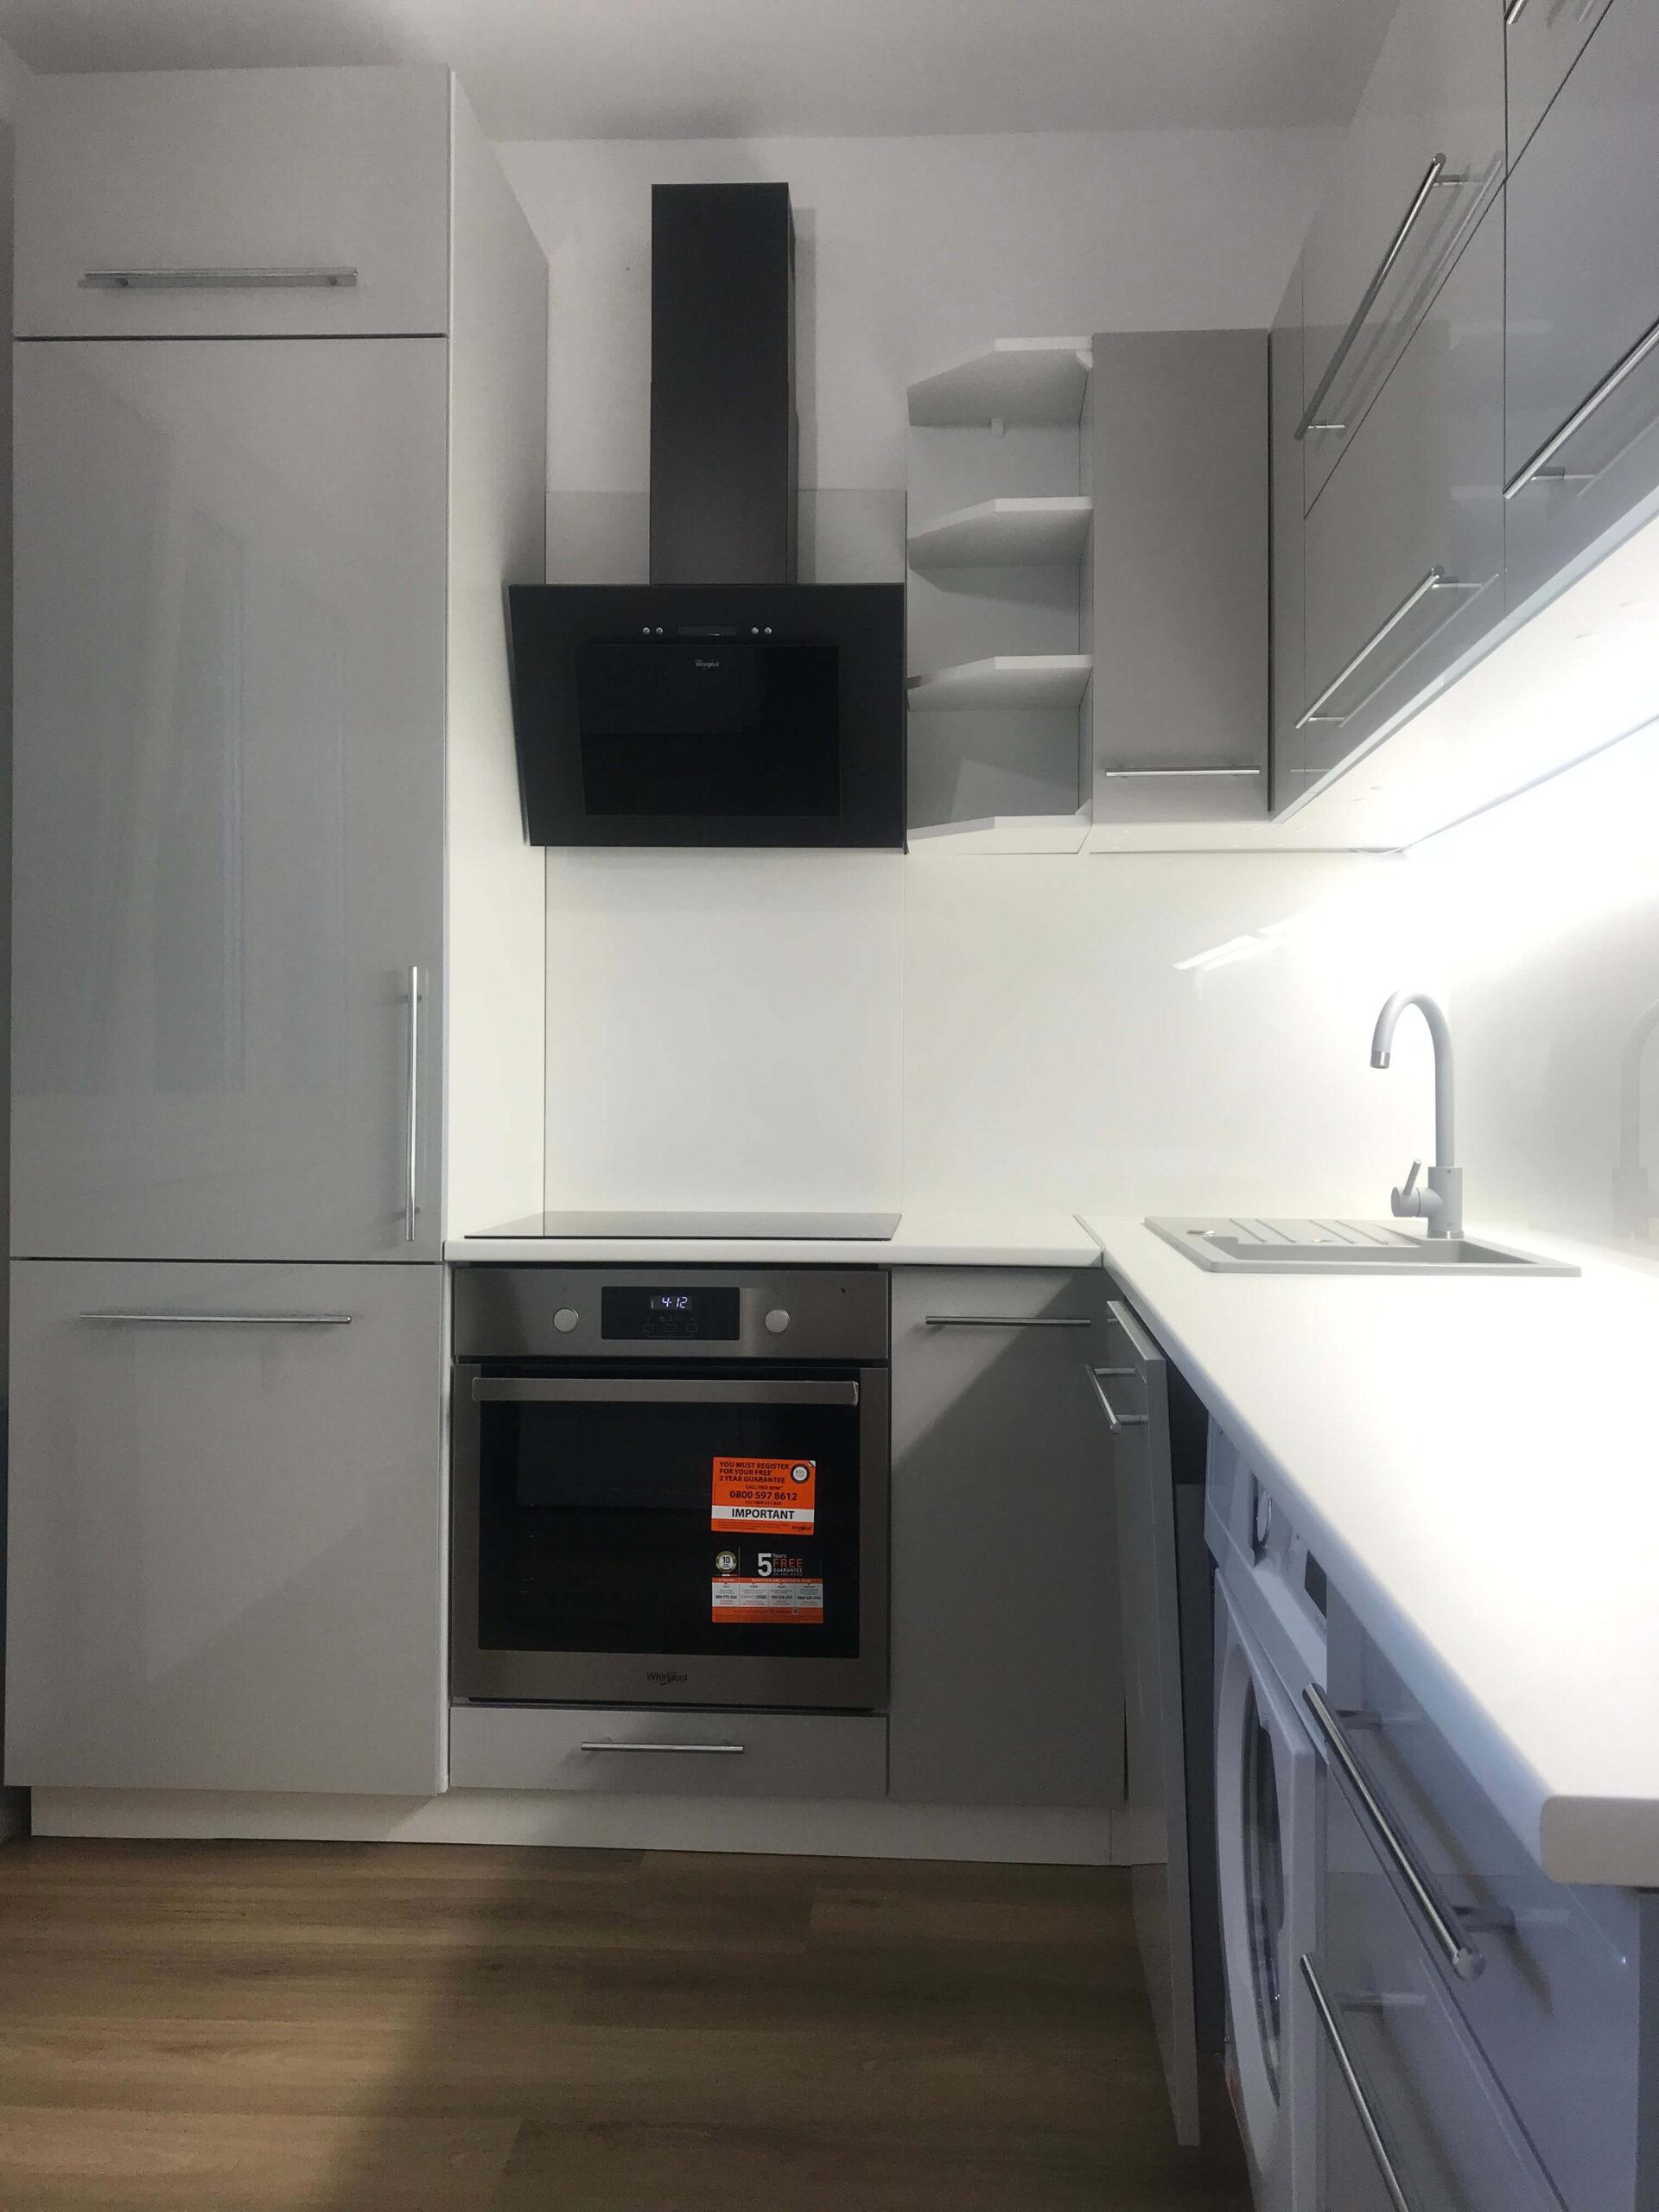 Predaj kompletne zrekonštruovaného 3 izbového bytu v Prievoze